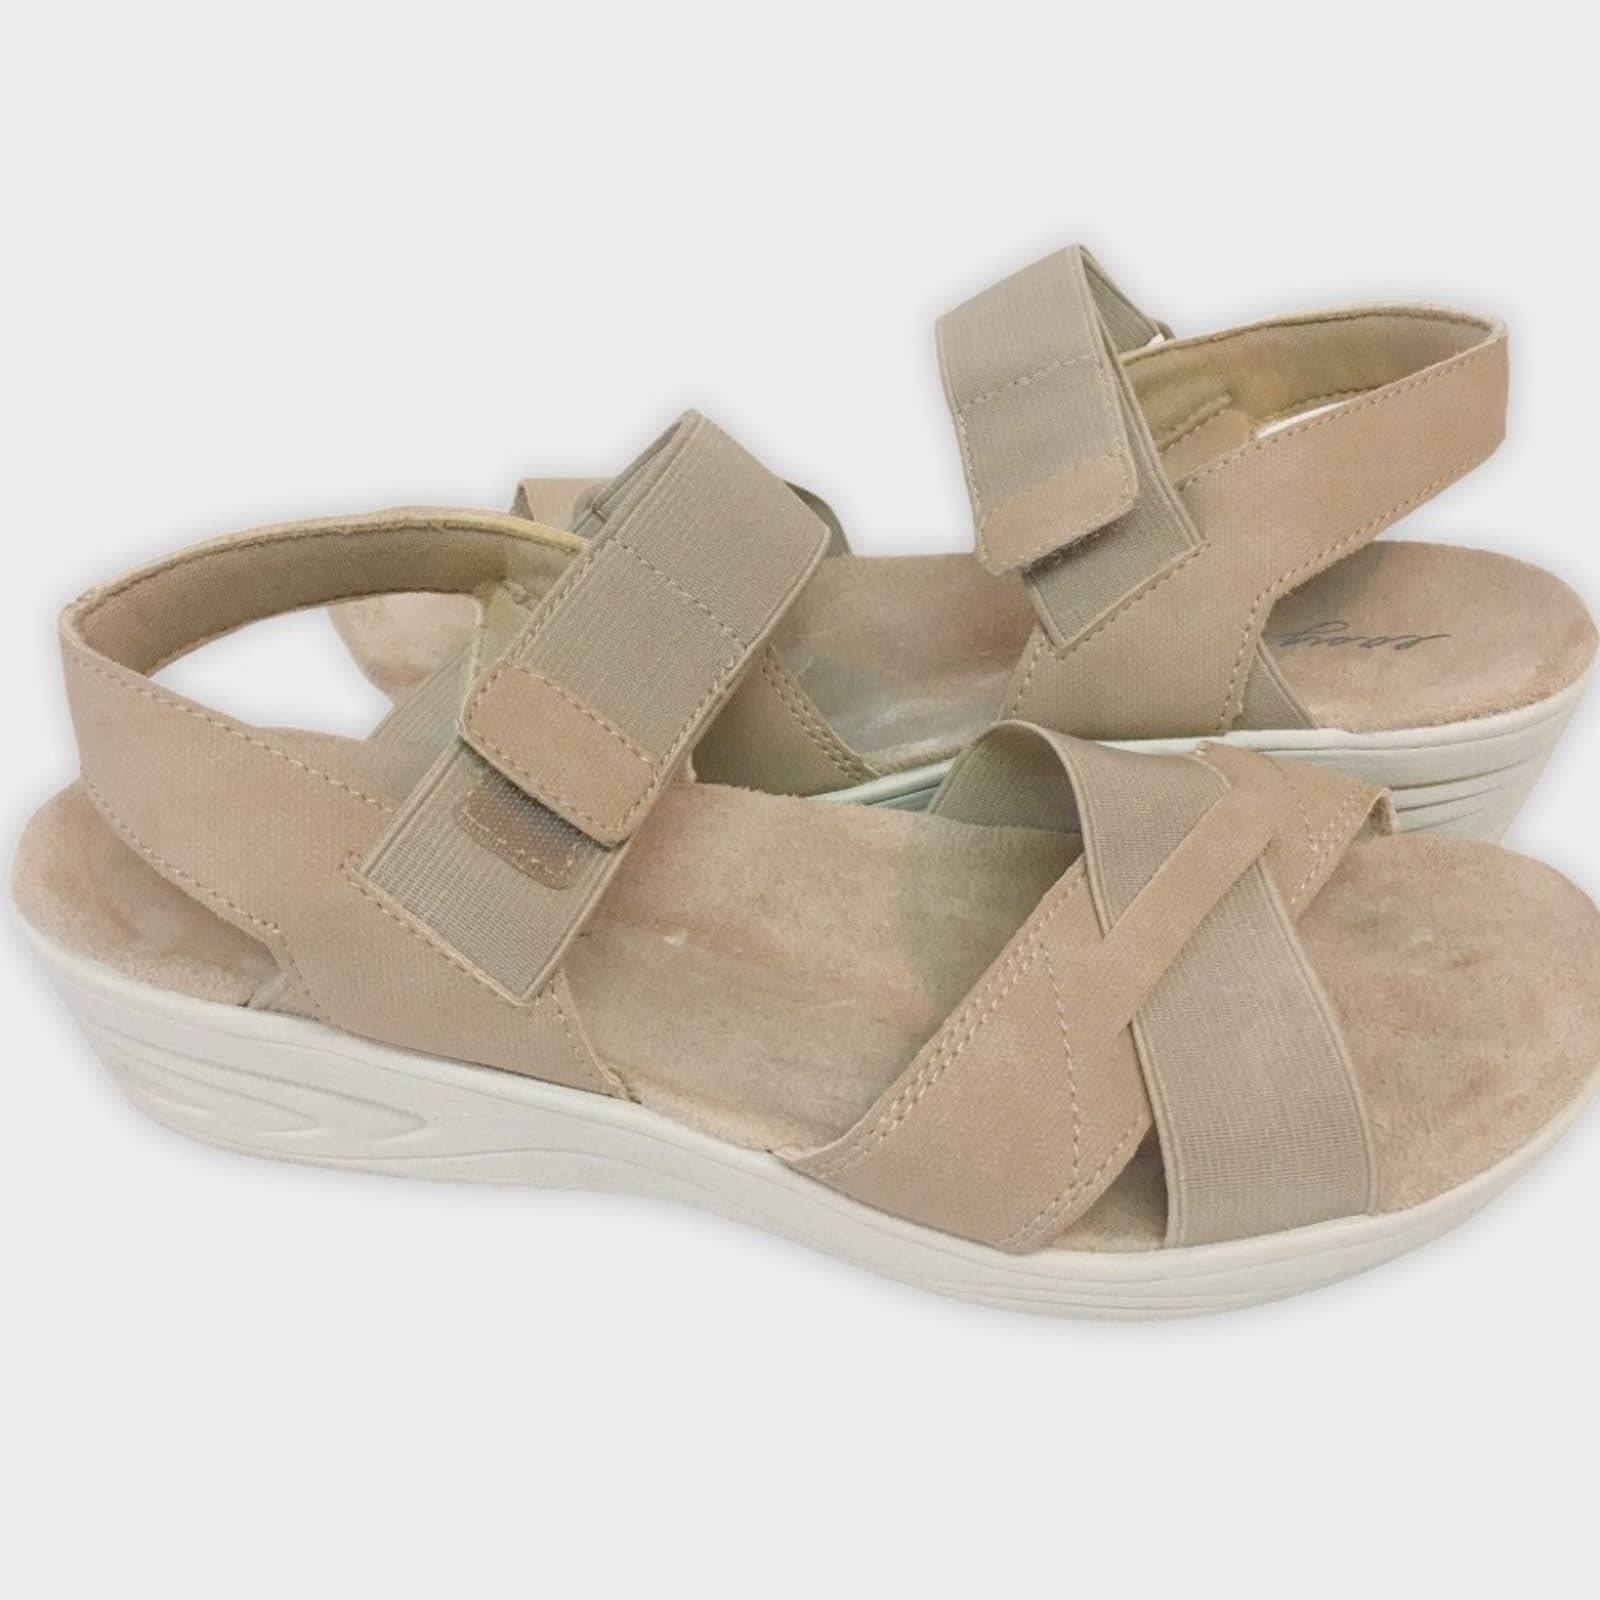 Easy Spirit tan Mattie sandals 8 M